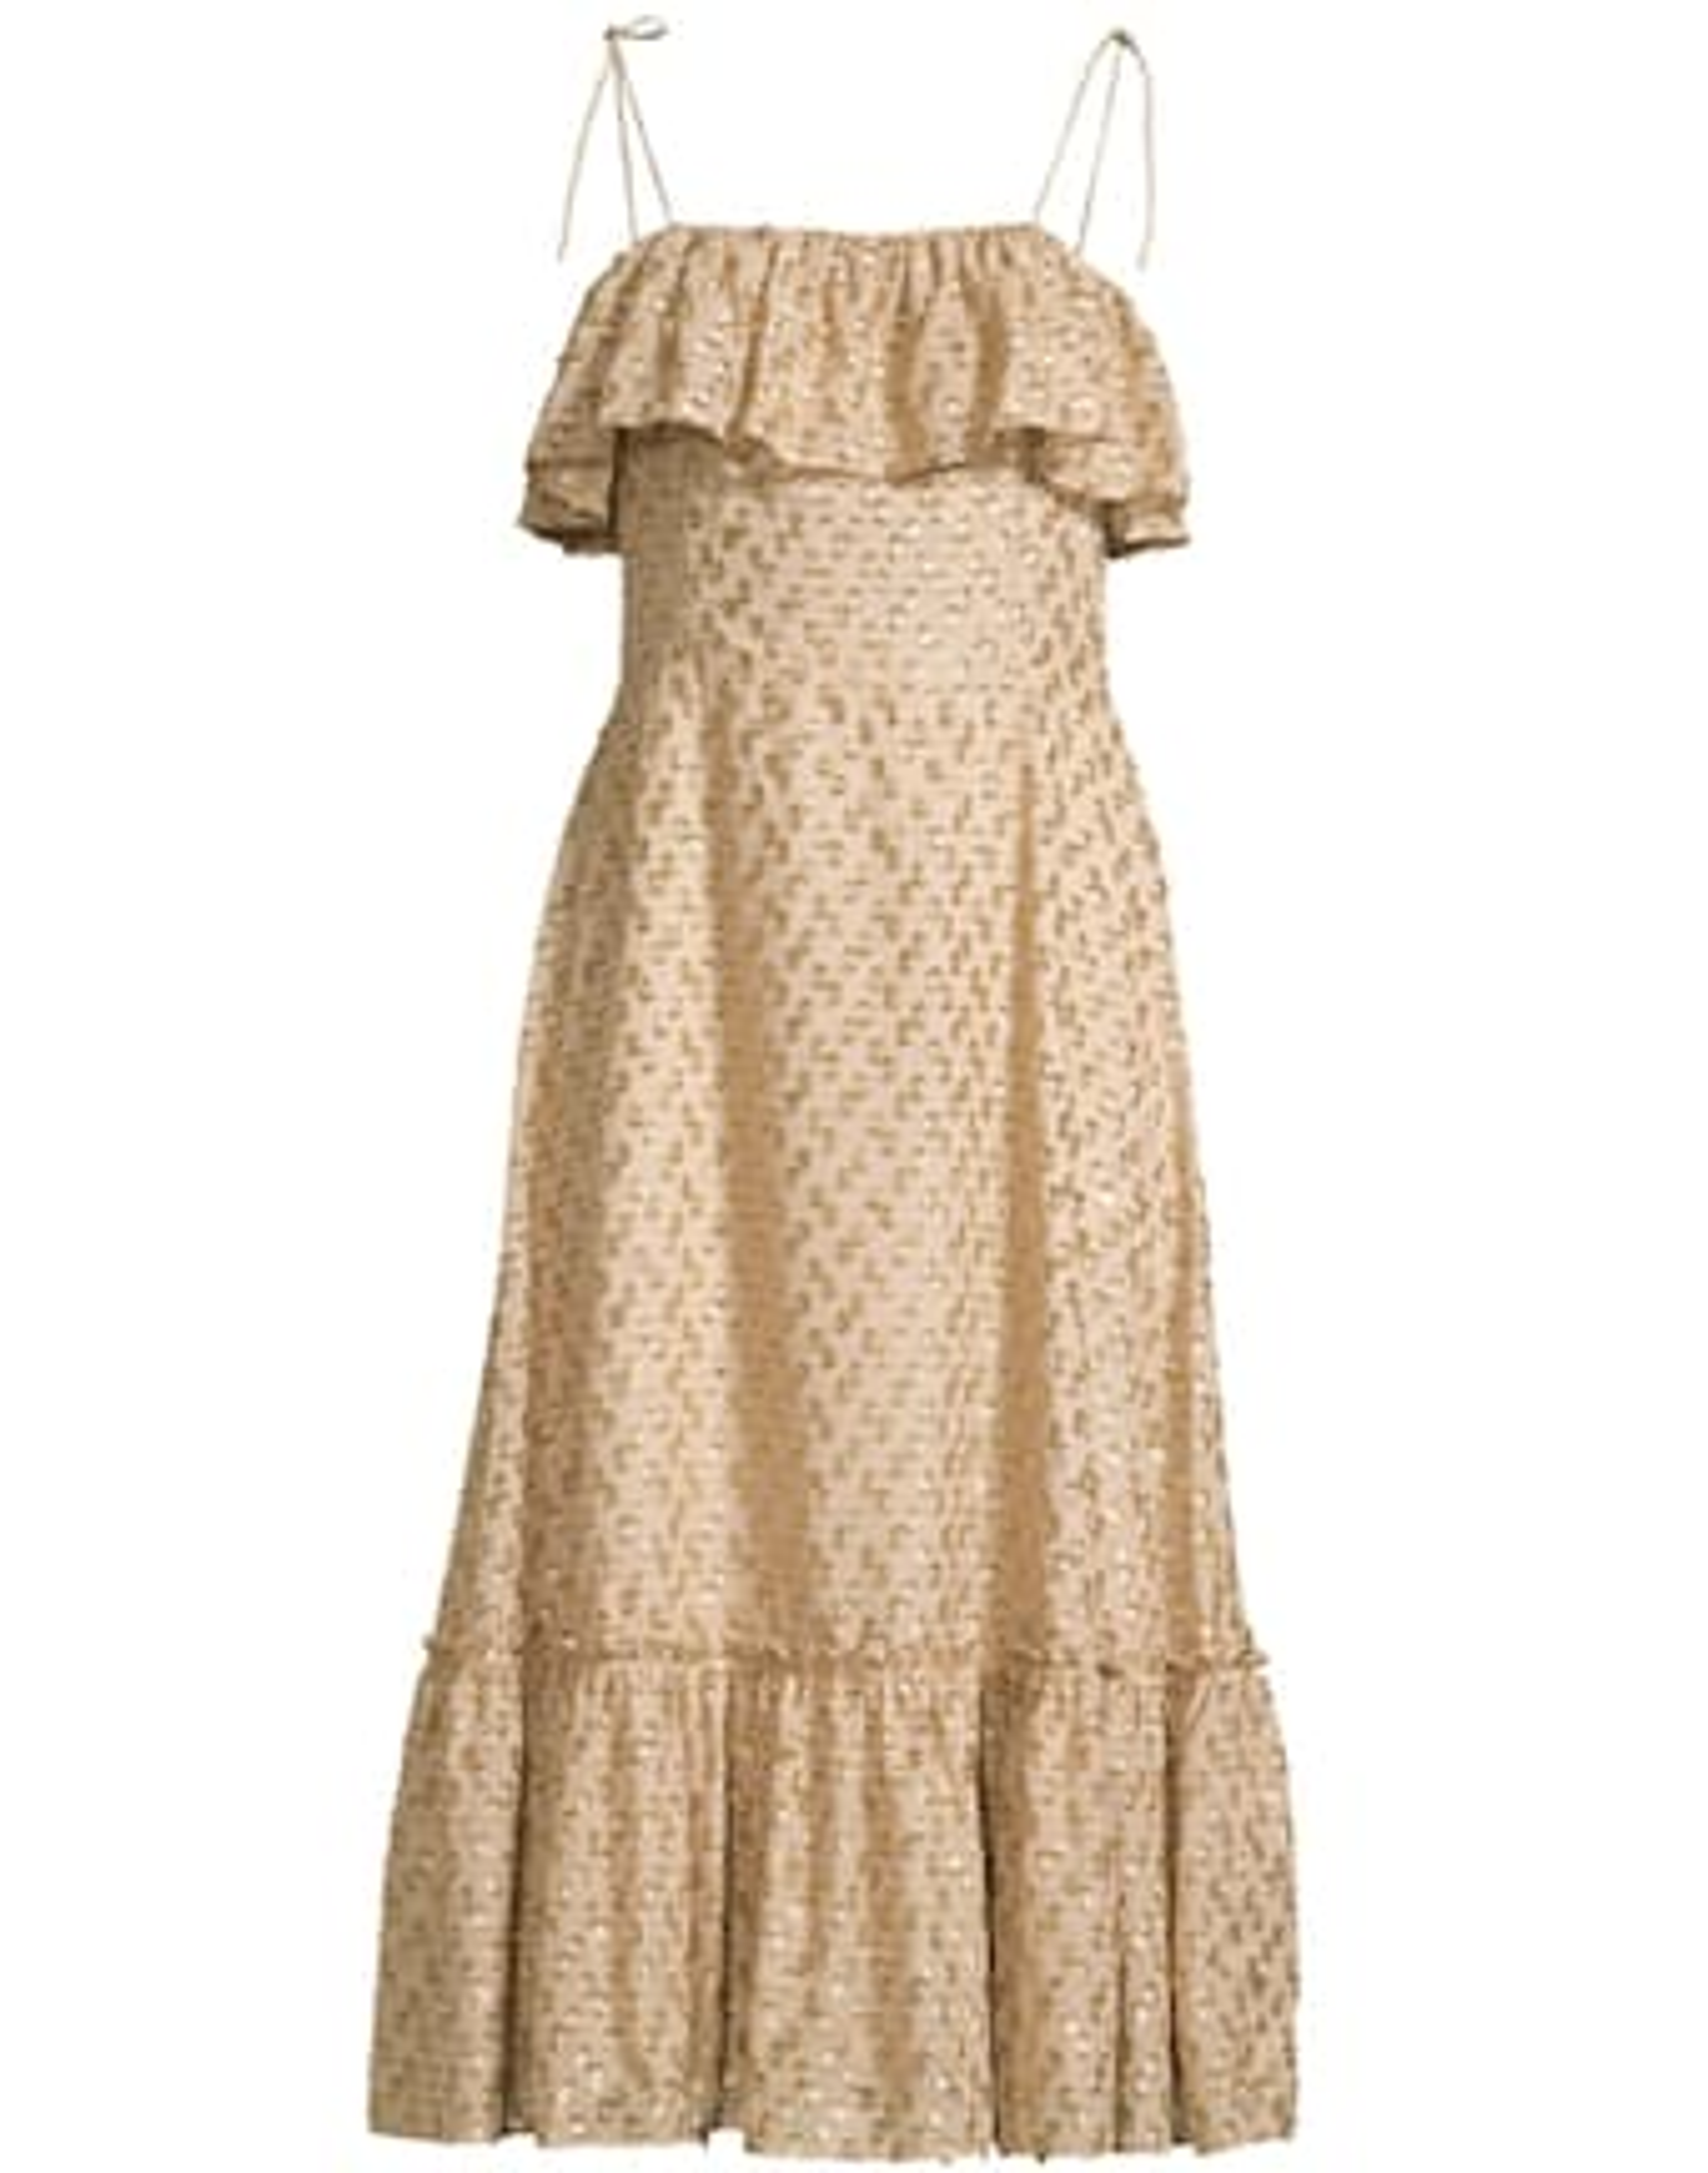 Elise Ruffle Midi Dress